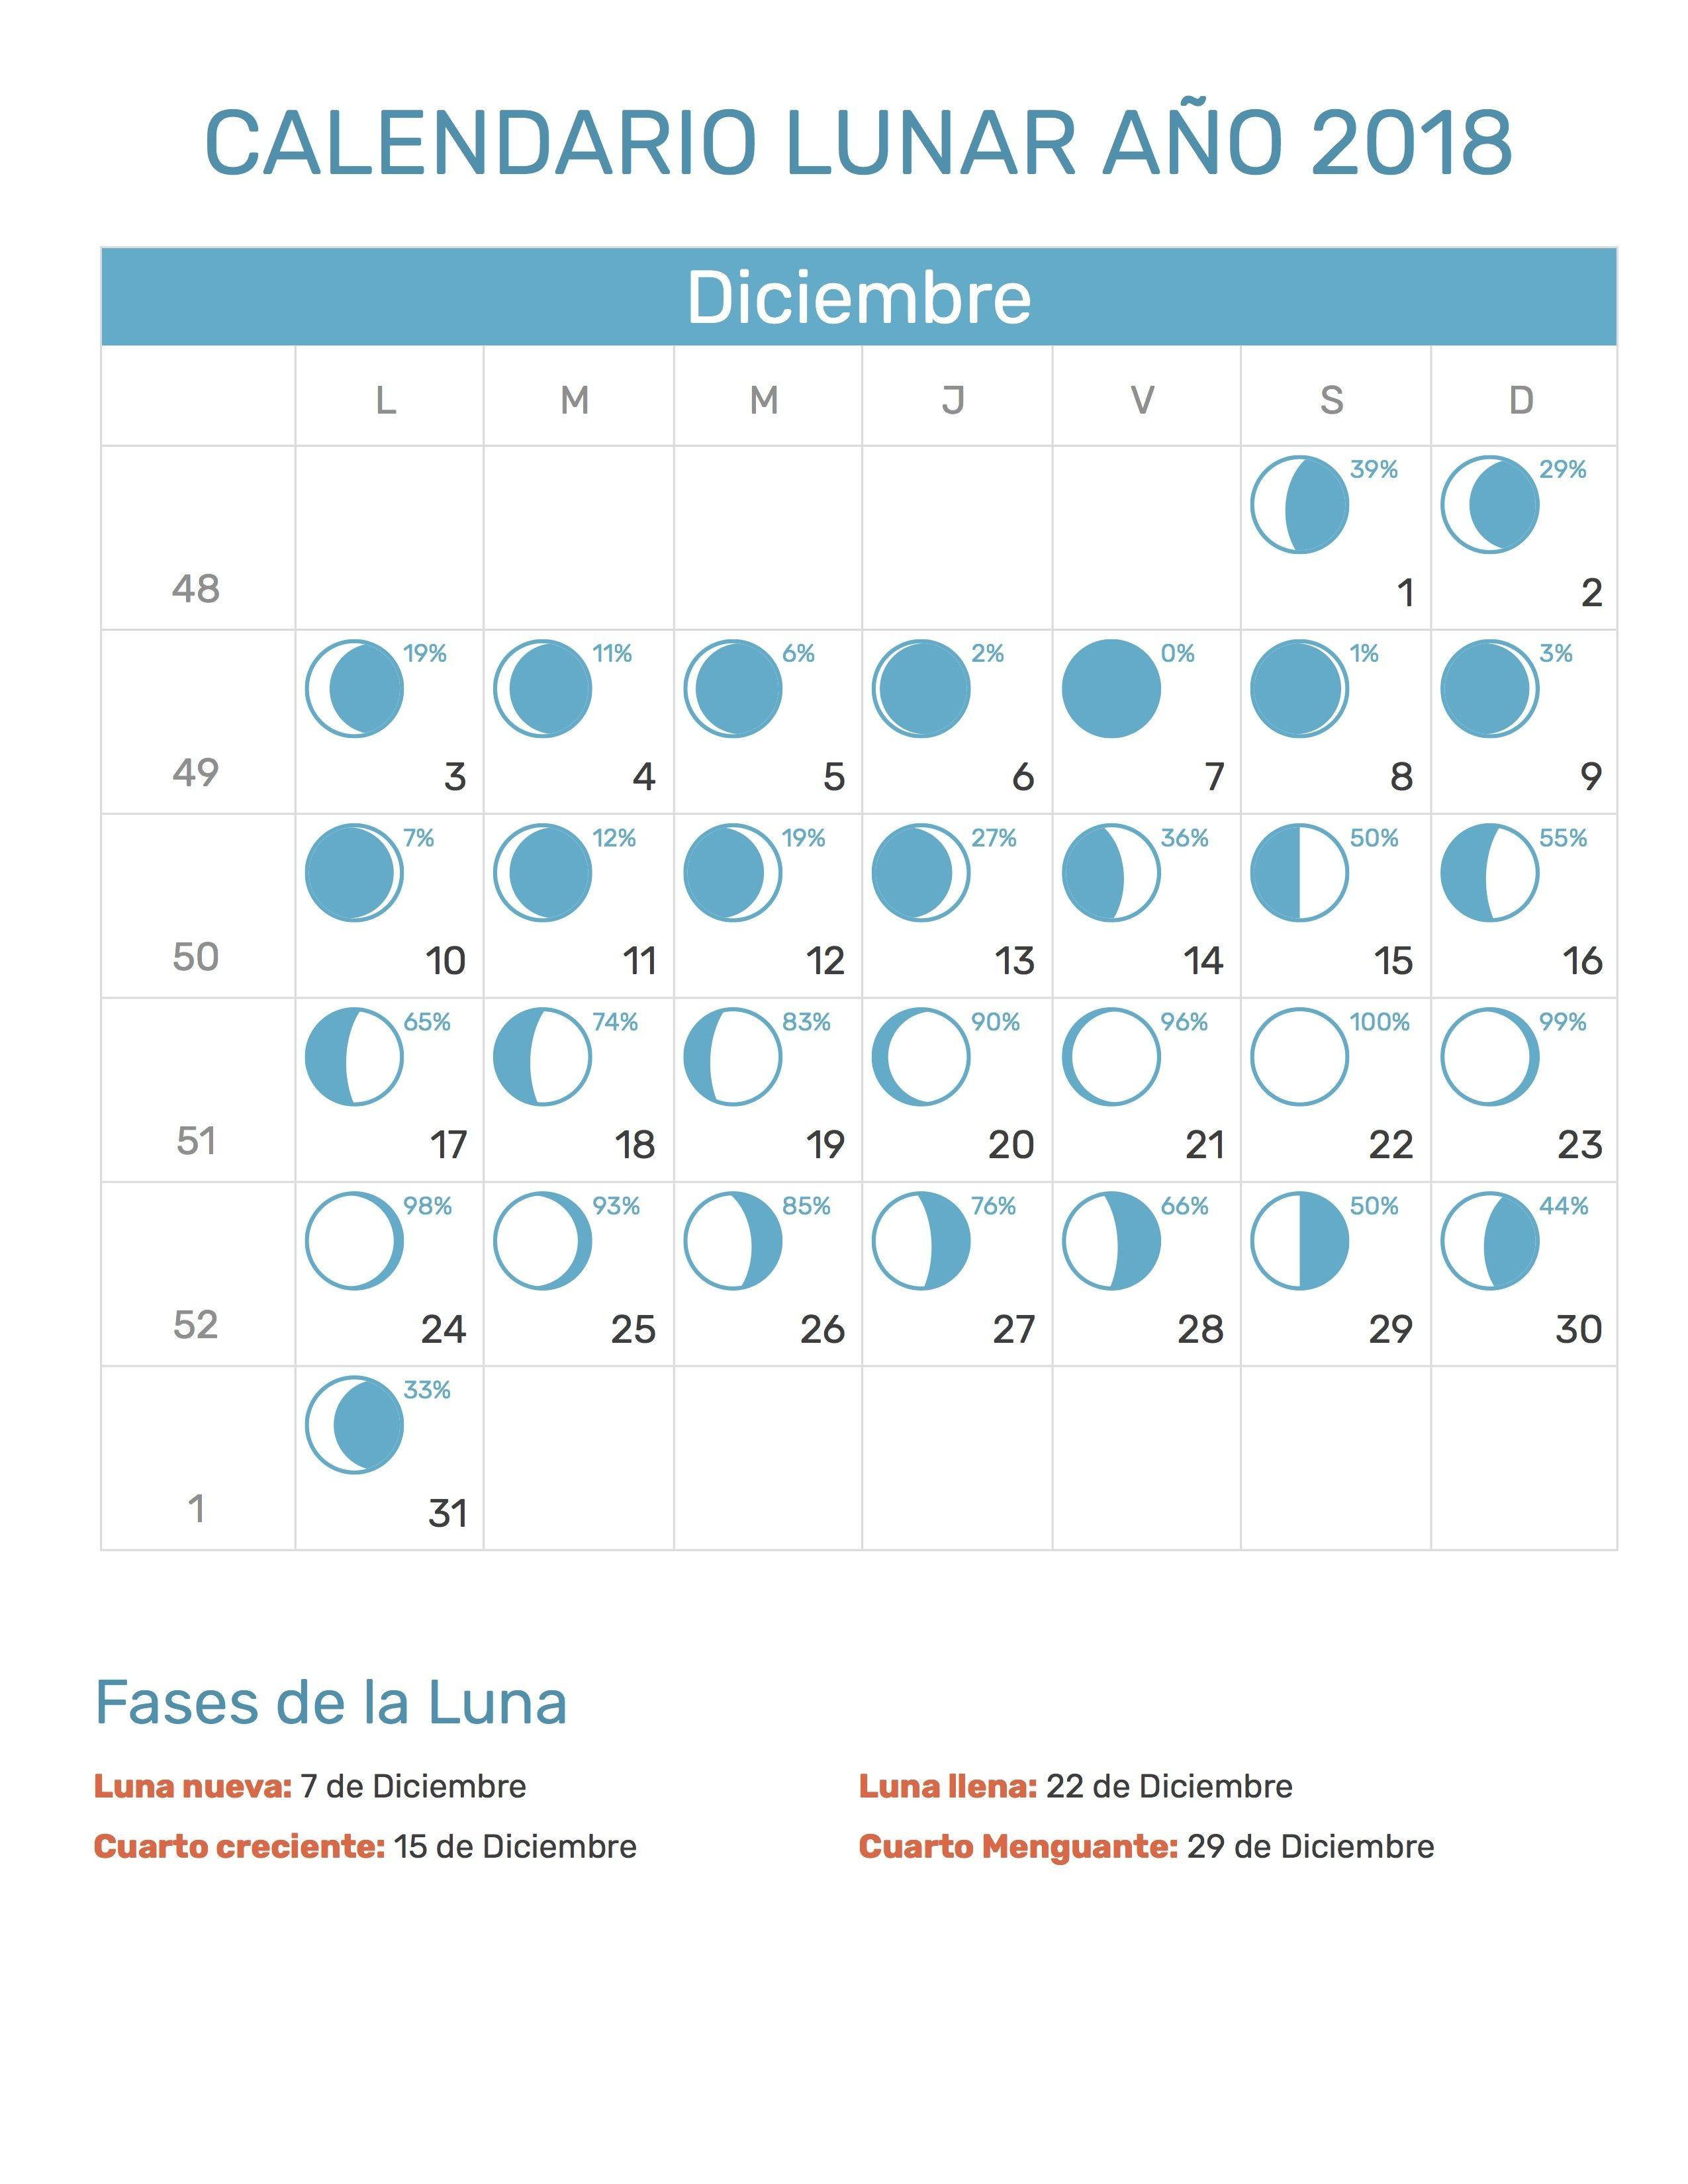 Calendario Para Imprimir Con Feriados 2019 Argentina Más Recientes Pin De Calendario Hispano En Calendario Lunar A±o 2018 Of Calendario Para Imprimir Con Feriados 2019 Argentina Más Caliente Best Calendario Marzo Abril 2017 Para Imprimir Image Collection